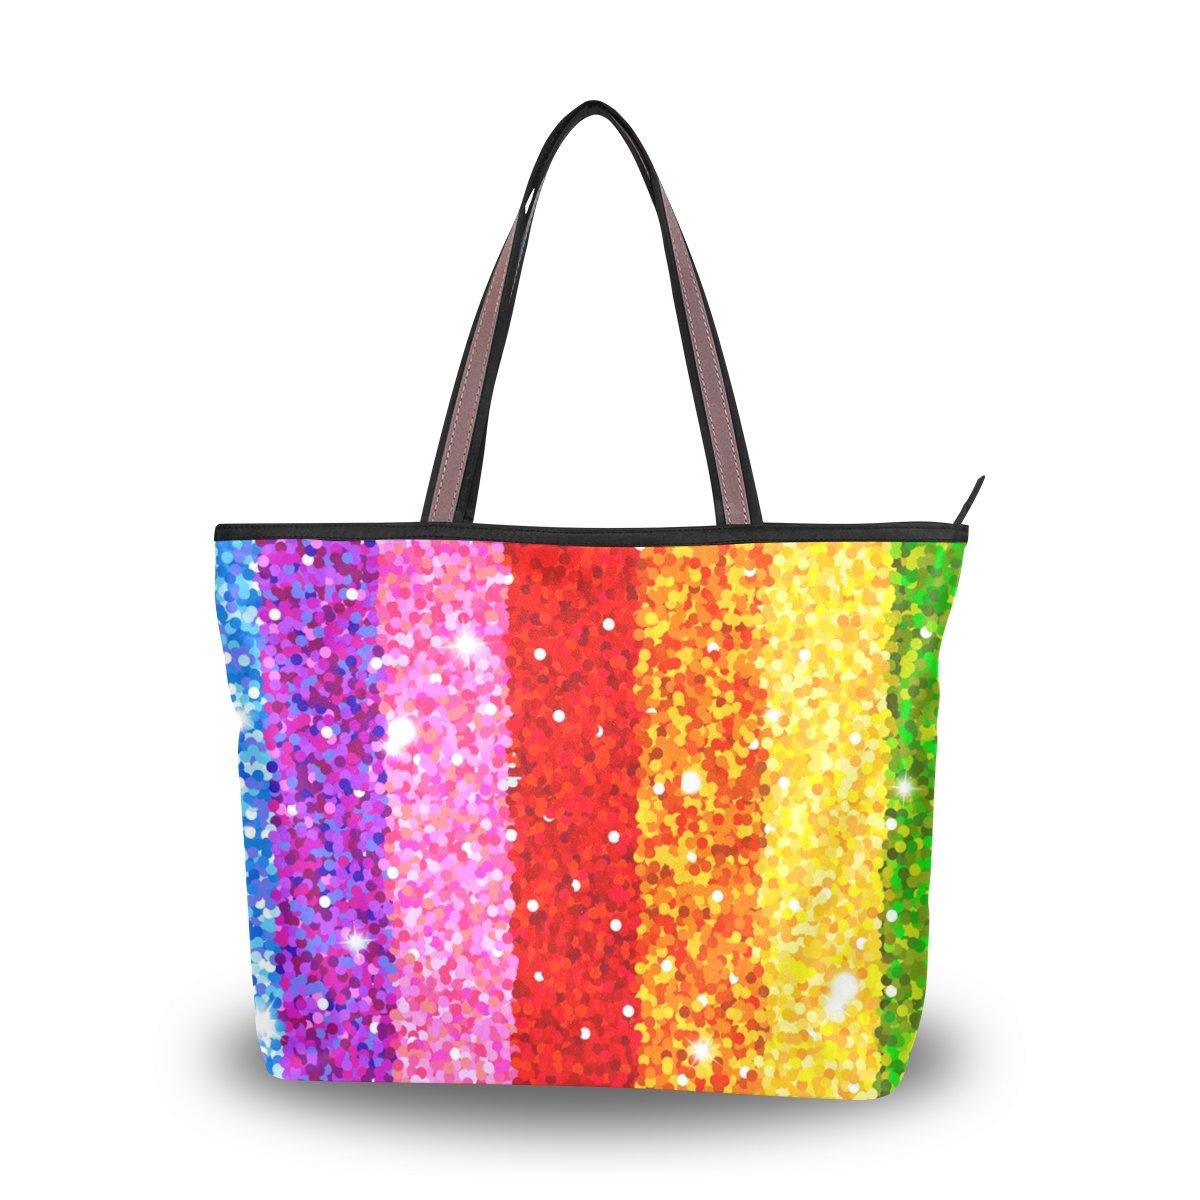 Travel Beach Bag Shopper Tote Handbag Shoulder Hand Purse for Women Strap Girls Glitter Rainbow Medium